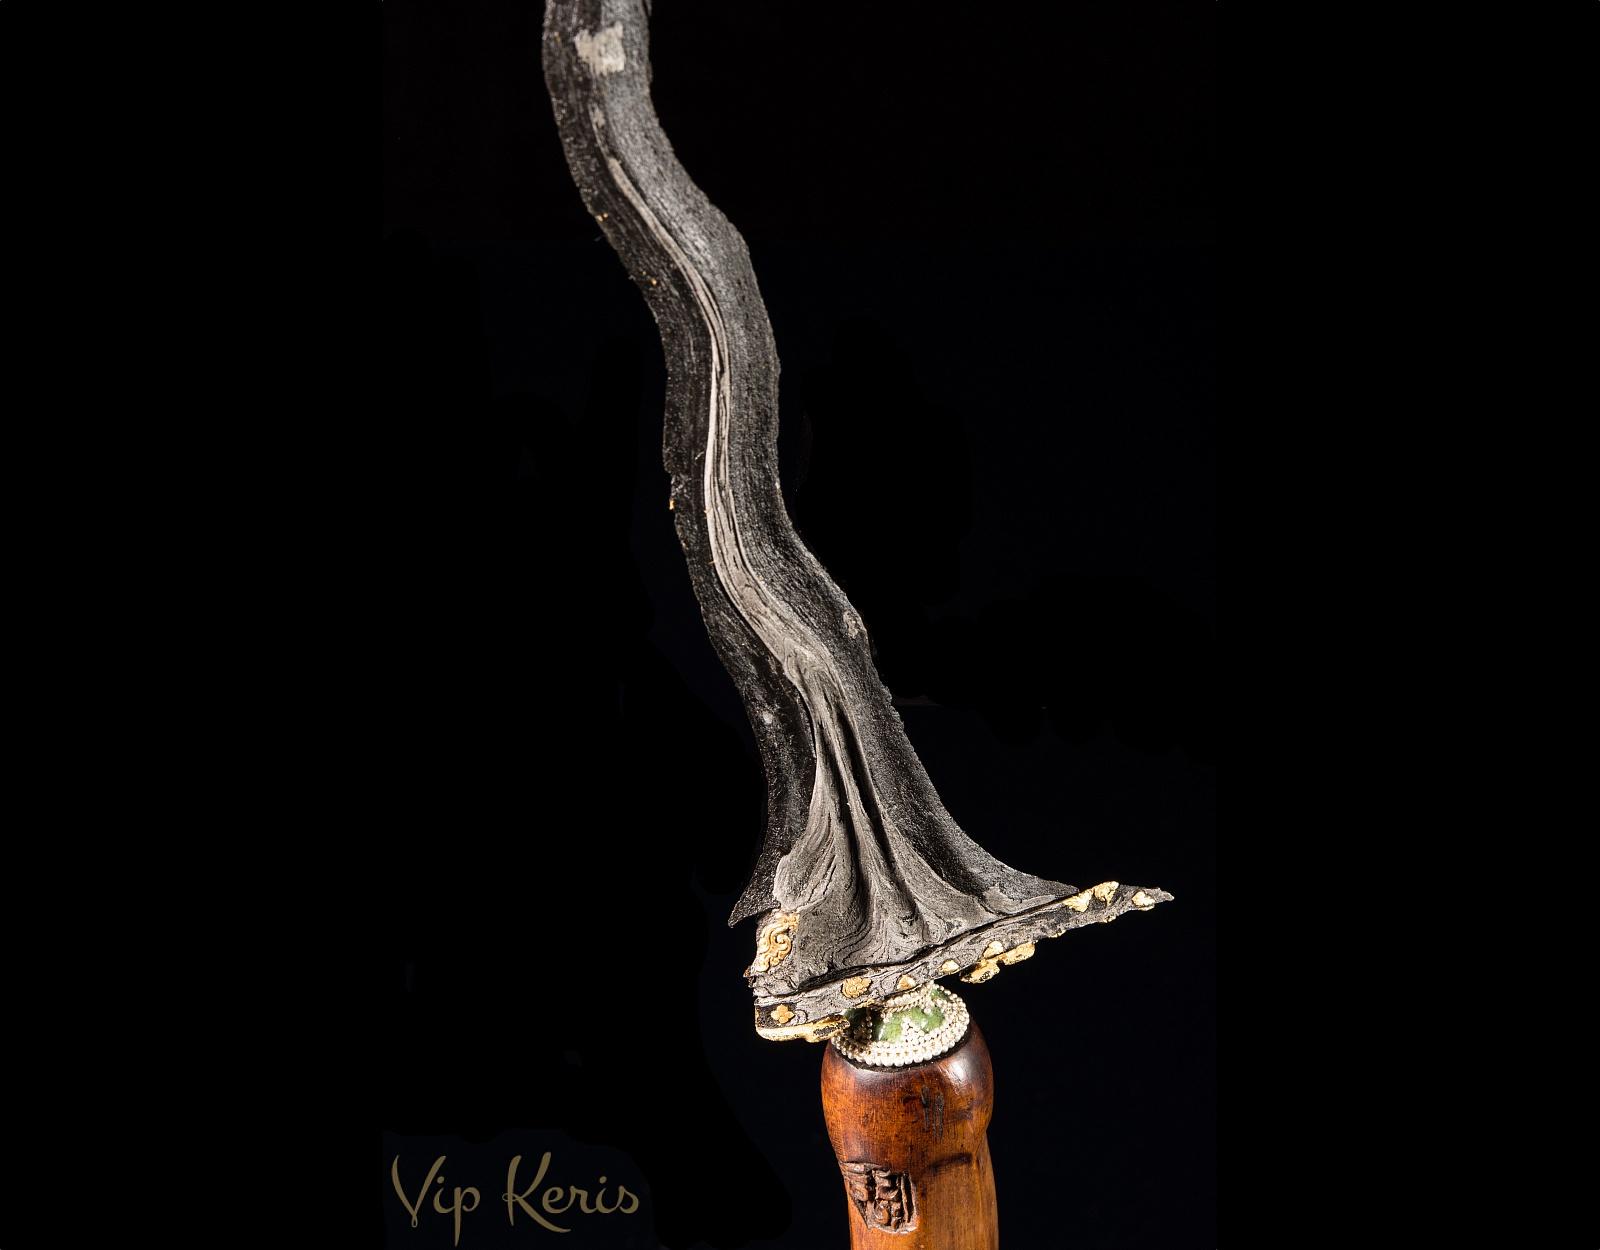 Нож Крис Sengkelat Kinatah Panji Wilis фото VipKeris